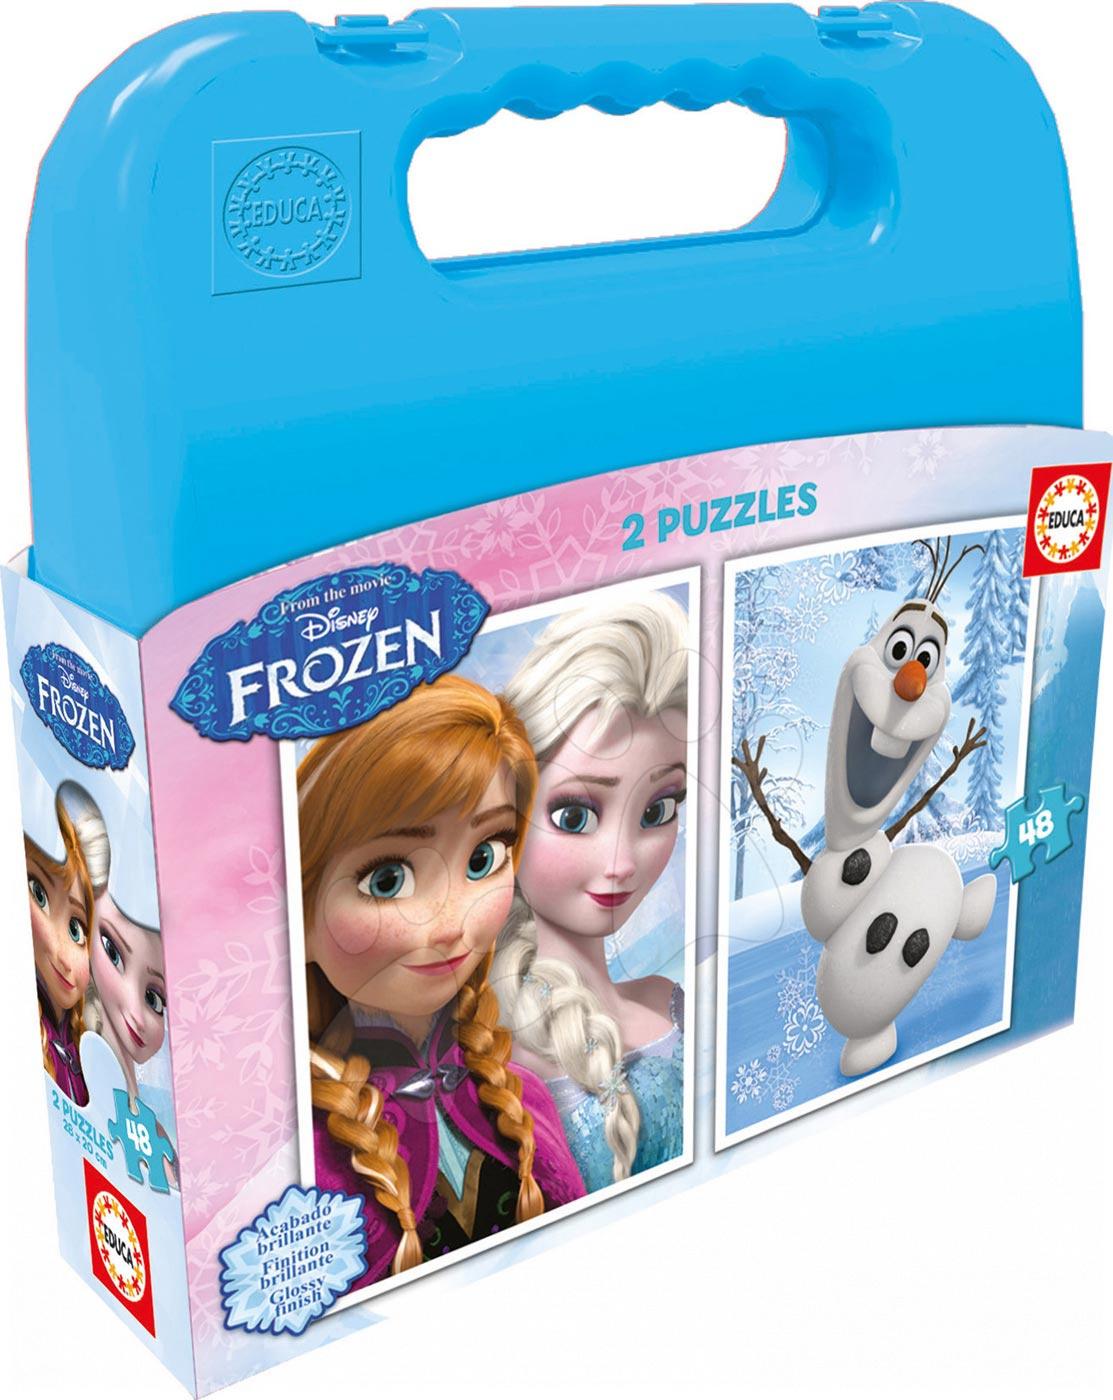 Detské puzzle do 100 dielov - Puzzle Frozen Educa v kufríku 2x48 dielov